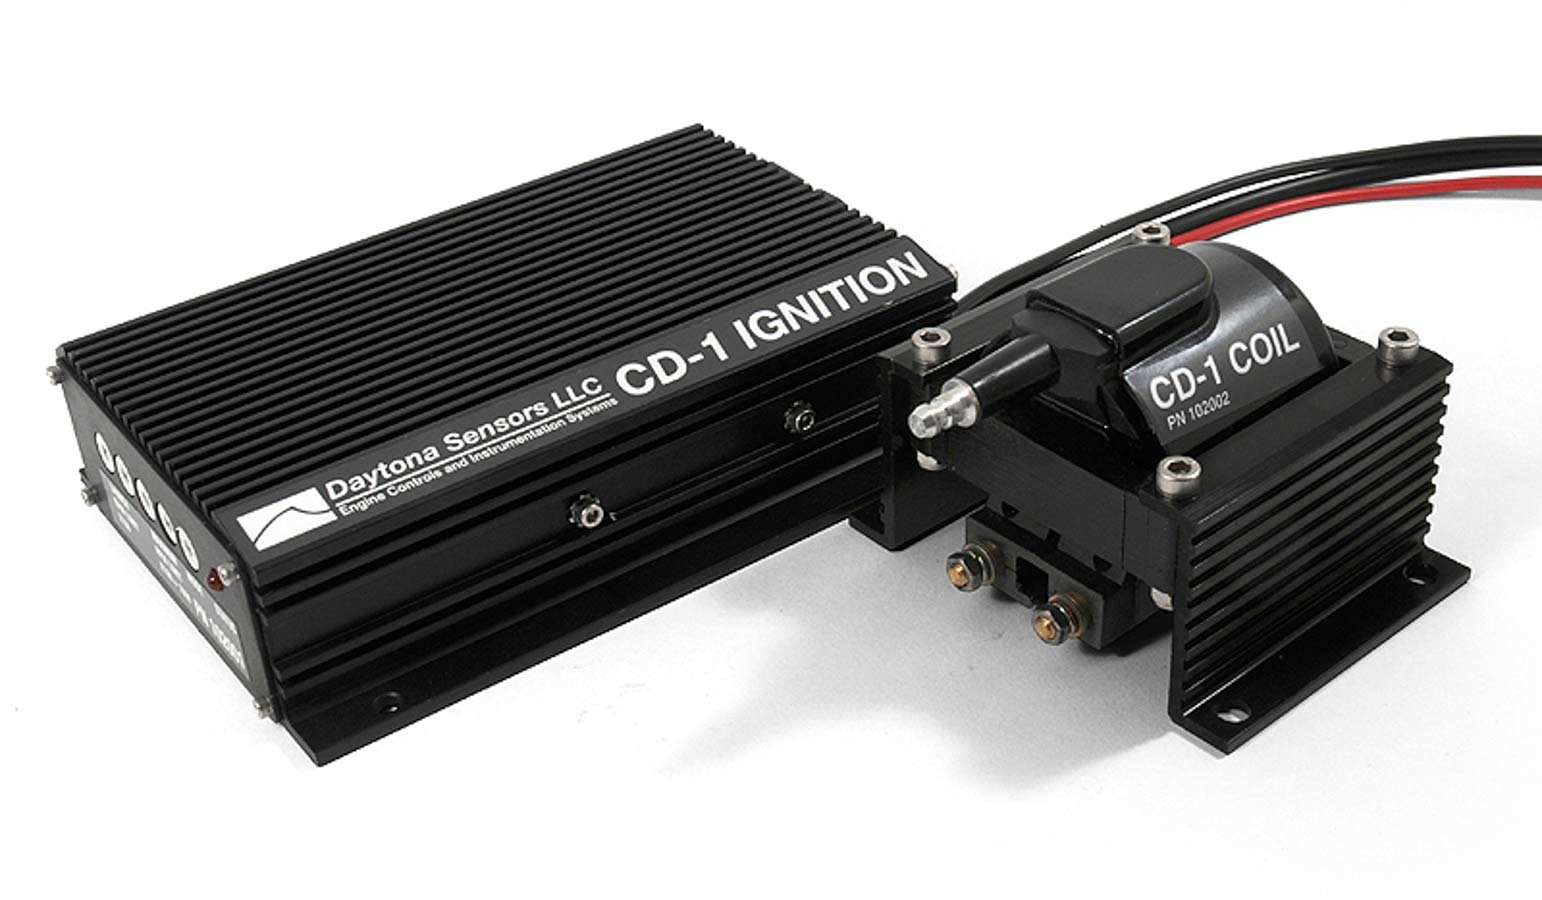 Daytona Sensors 102003 Ignition Kit, CD-1, CD Ignition Box, Coil, USB Interface, Kit